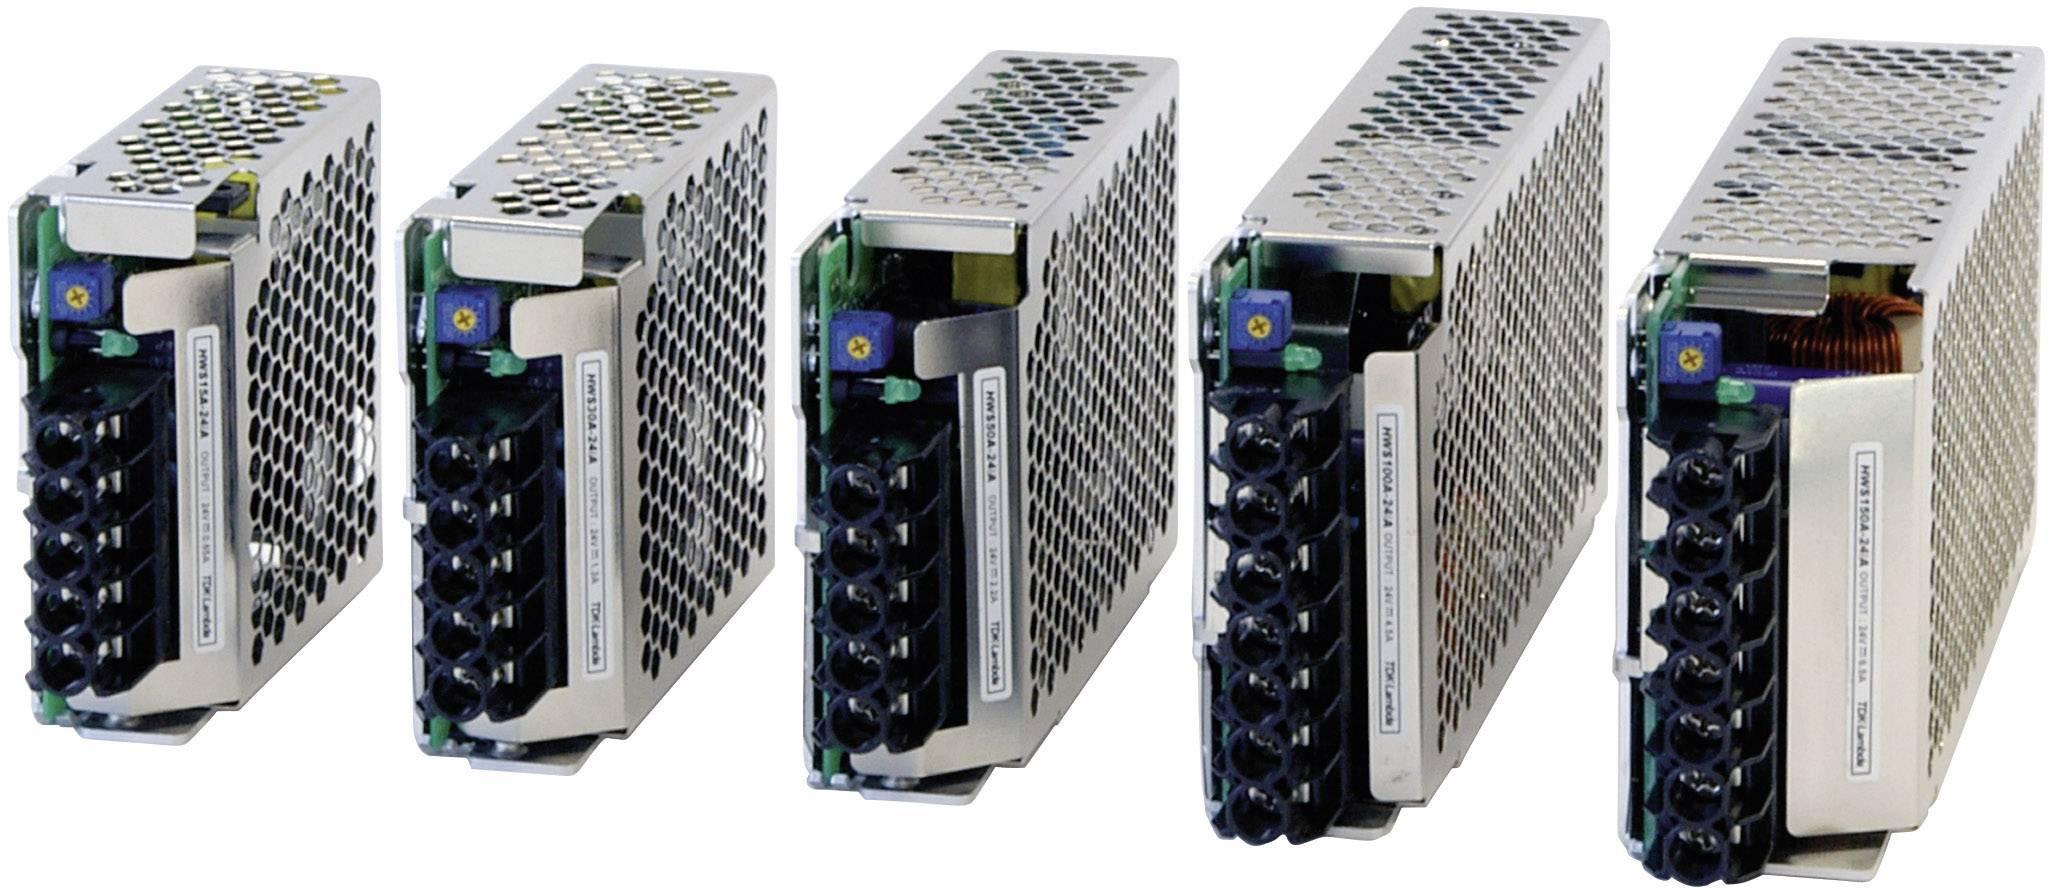 Zabudovateľný napájací zdroj TDK-Lambda HWS-150A-15/A, 15 V, 150 W